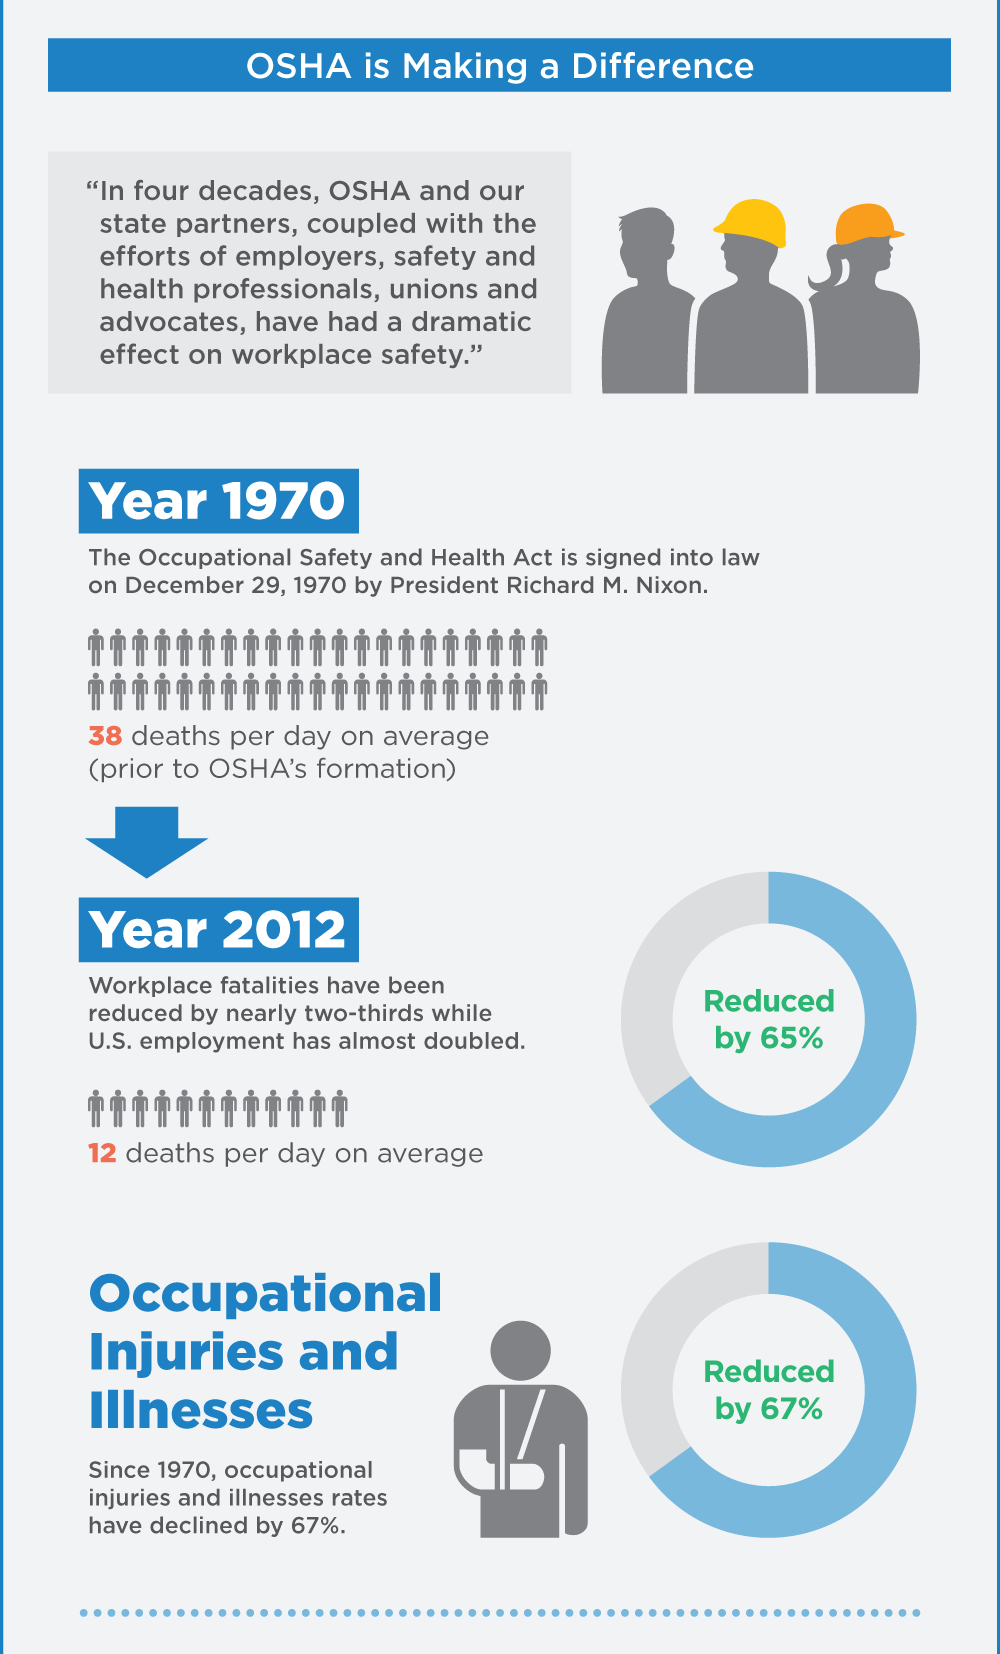 2014 OSHA Worker Fatality Statistics - 6